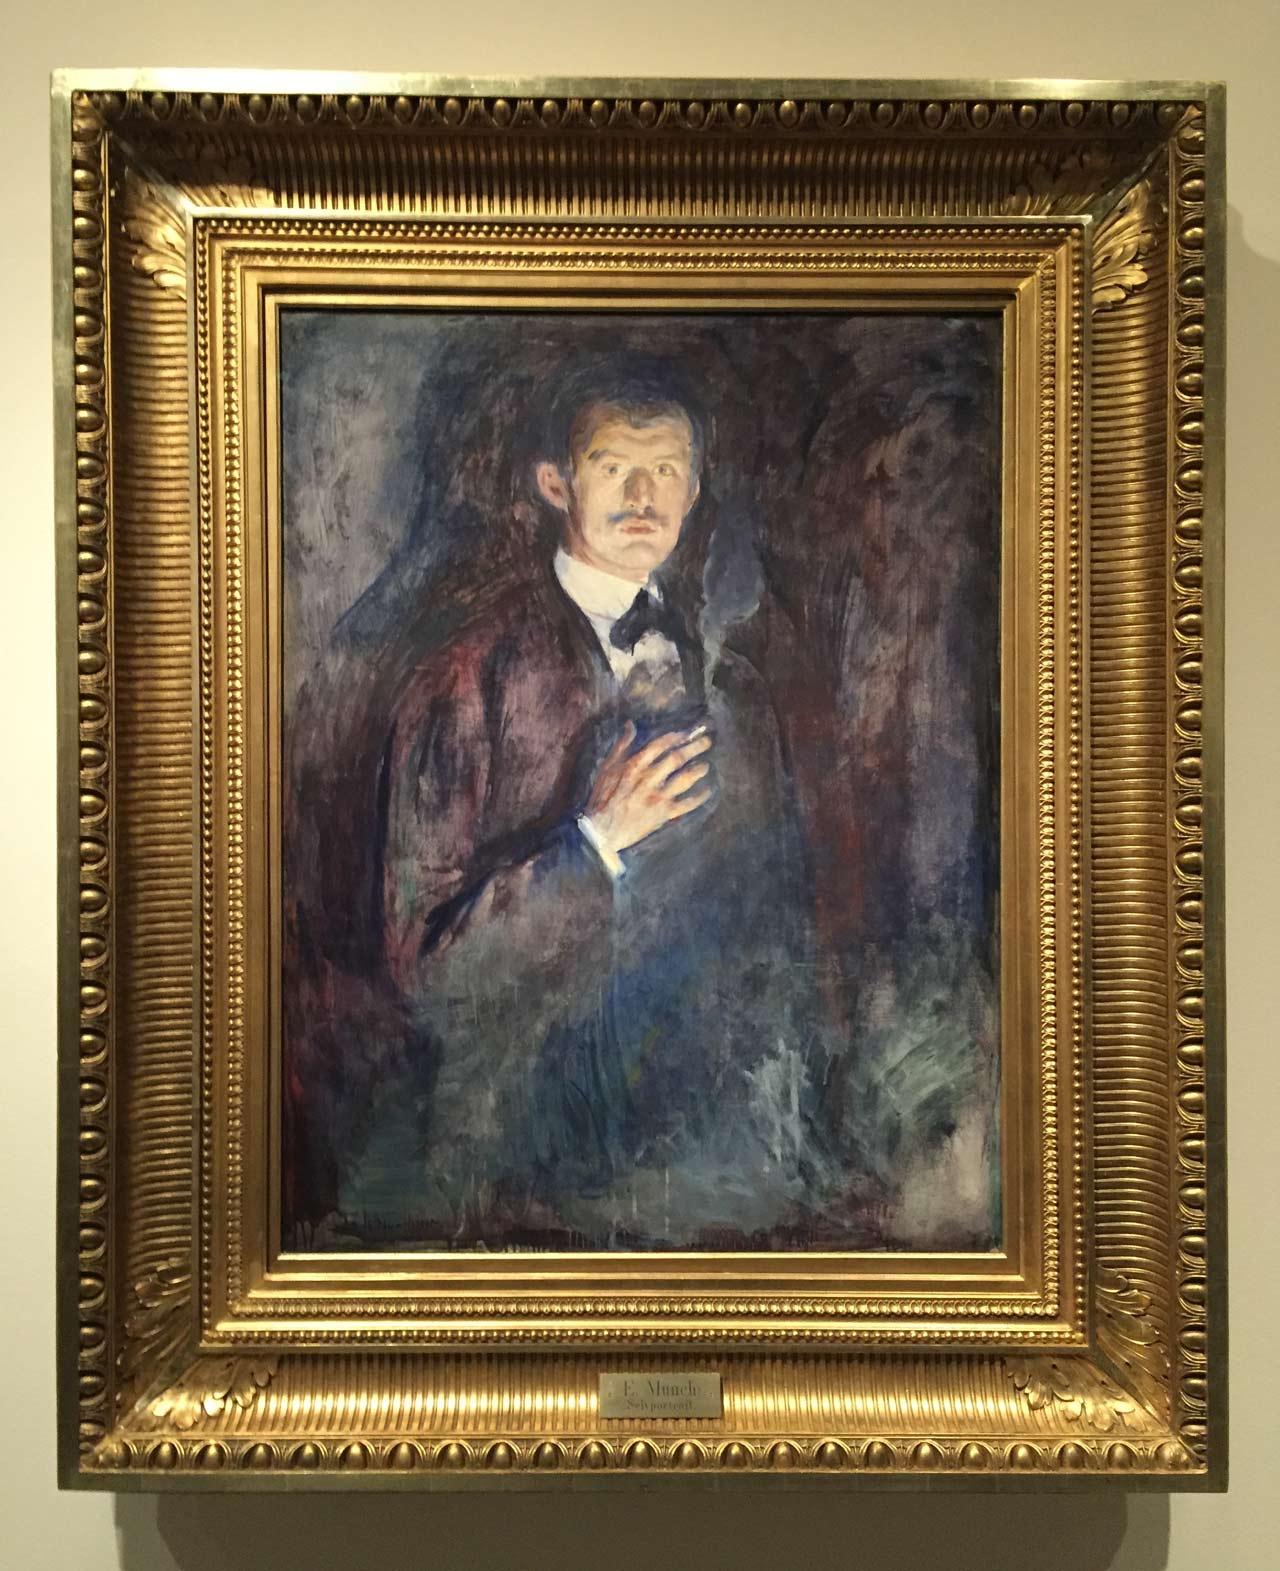 Edvard-Munch-Self-Portrait-with-Cigarette-1895-National-Museum-of-Art-Oslo.jpg